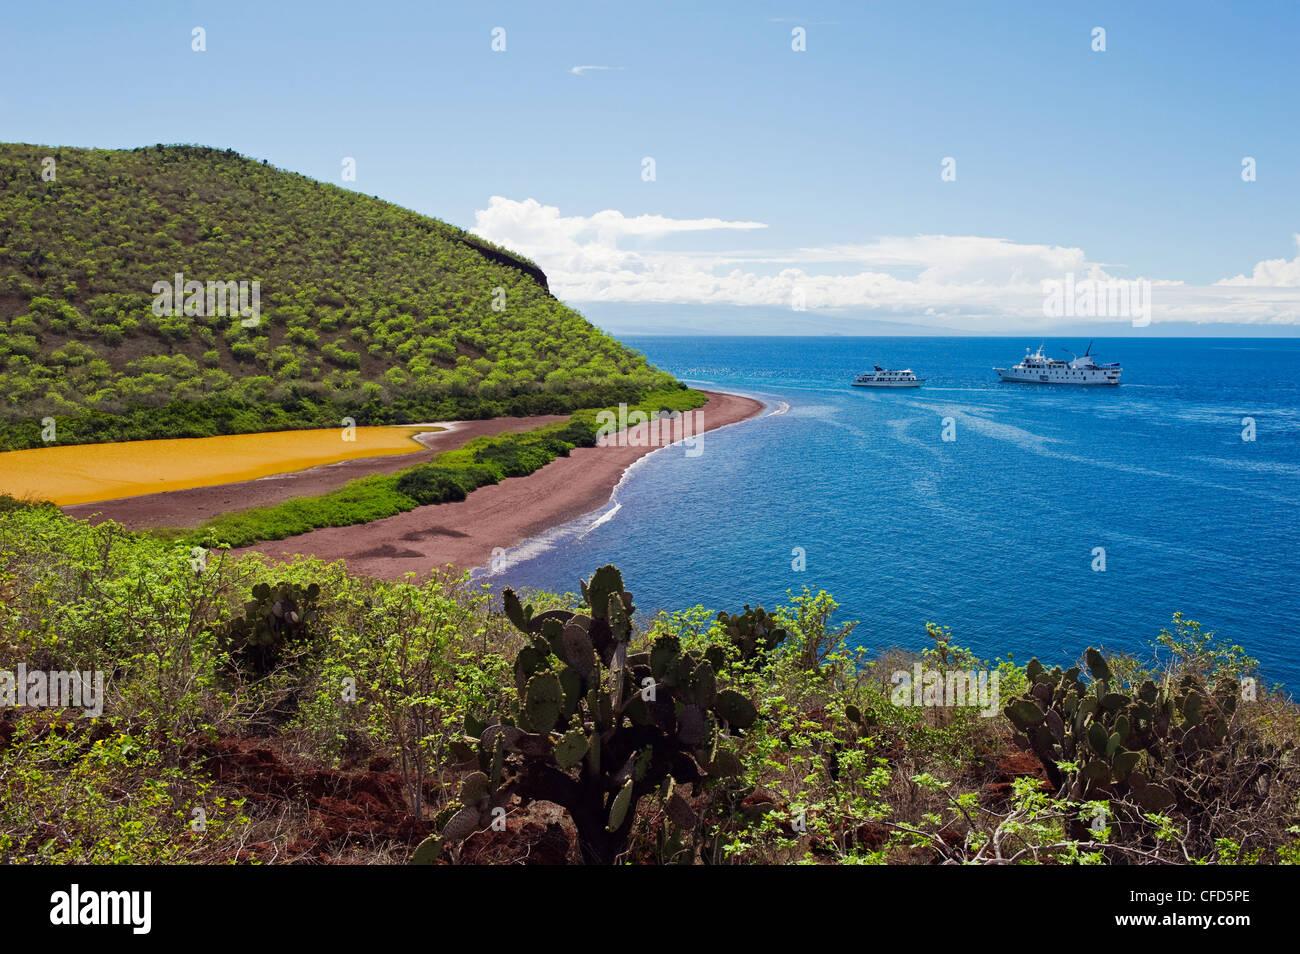 Galapagos Islands, UNESCO World Heritage Site, Ecuador, South America - Stock Image